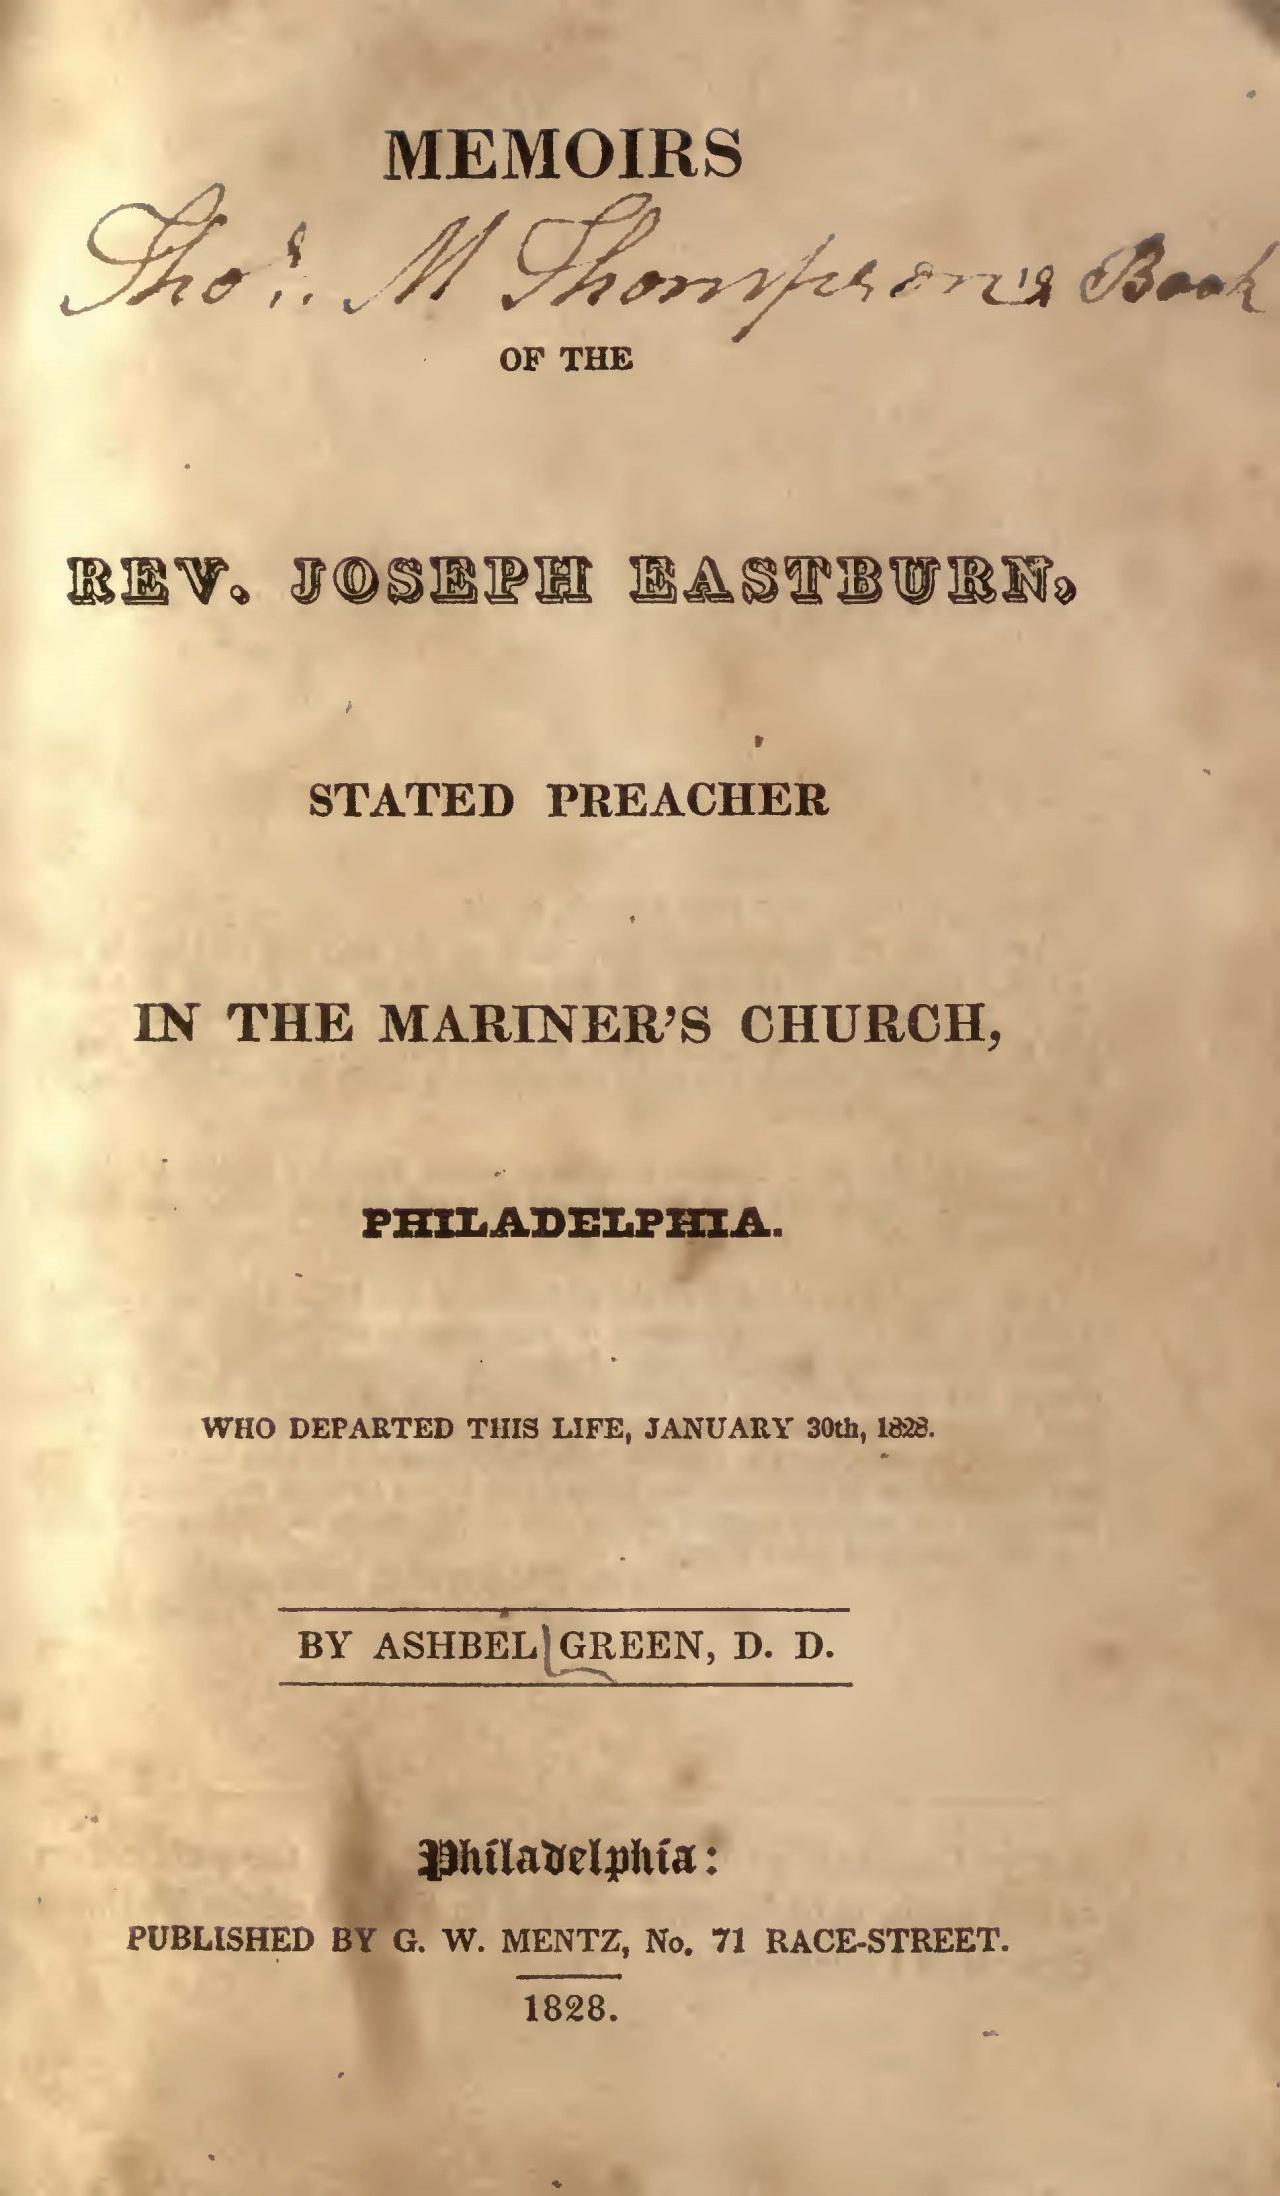 Eastburn, Joseph, Memoirs of the Rev. Joseph Eastburn Title Page.jpg